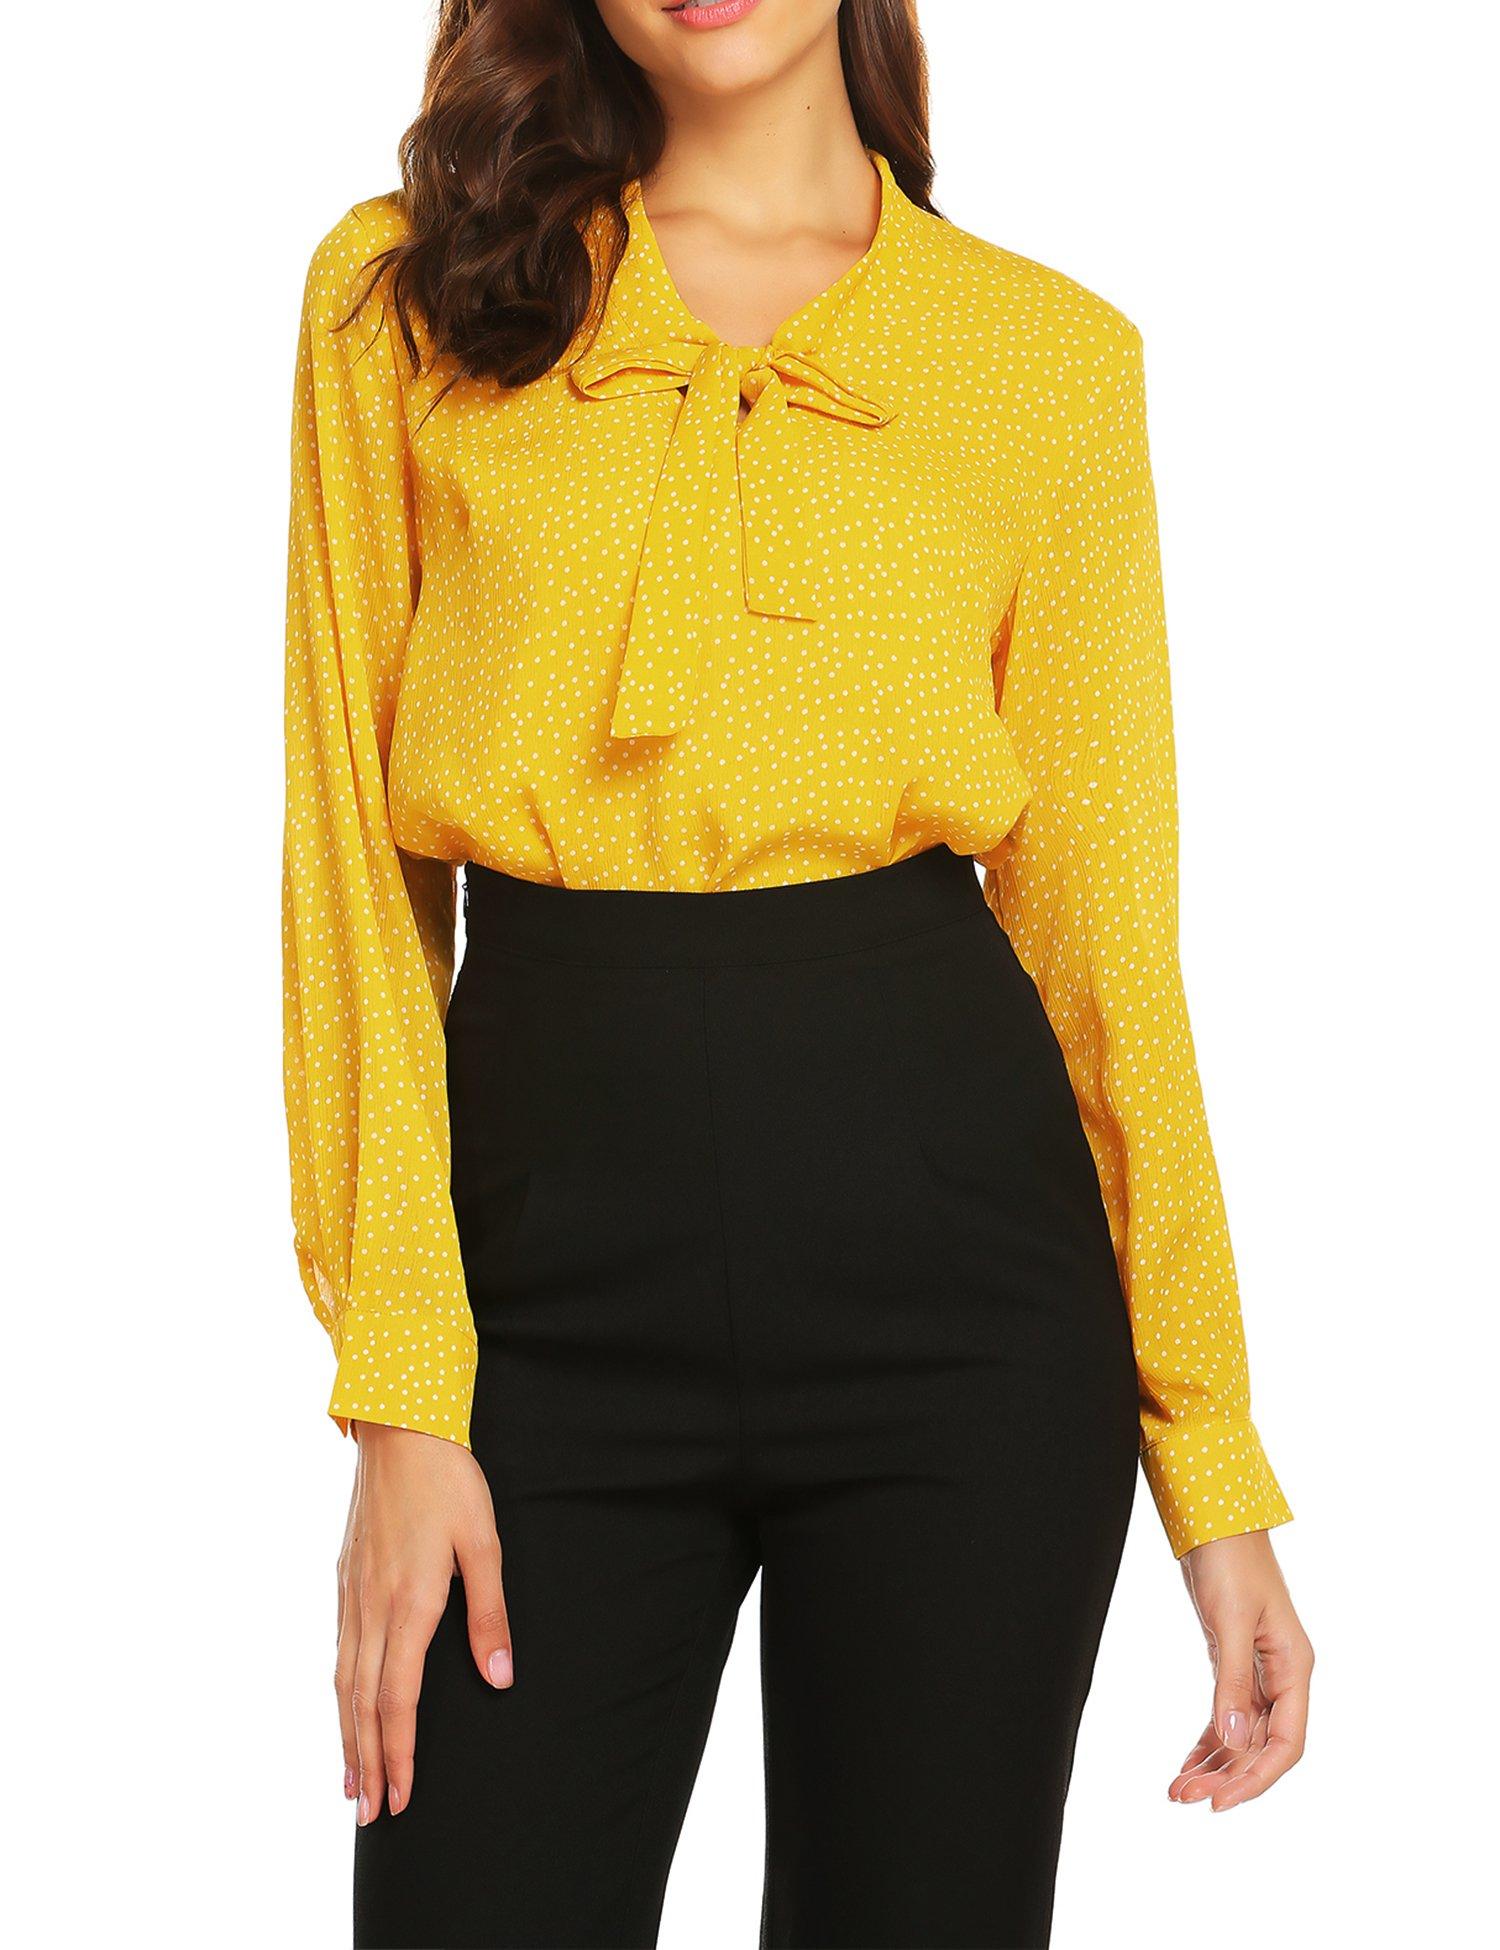 ACEVOG Women Casual Long Sleeve Roll-up Sleeve Chiffon V Neck Blouse,Yellow Polka Dot,M